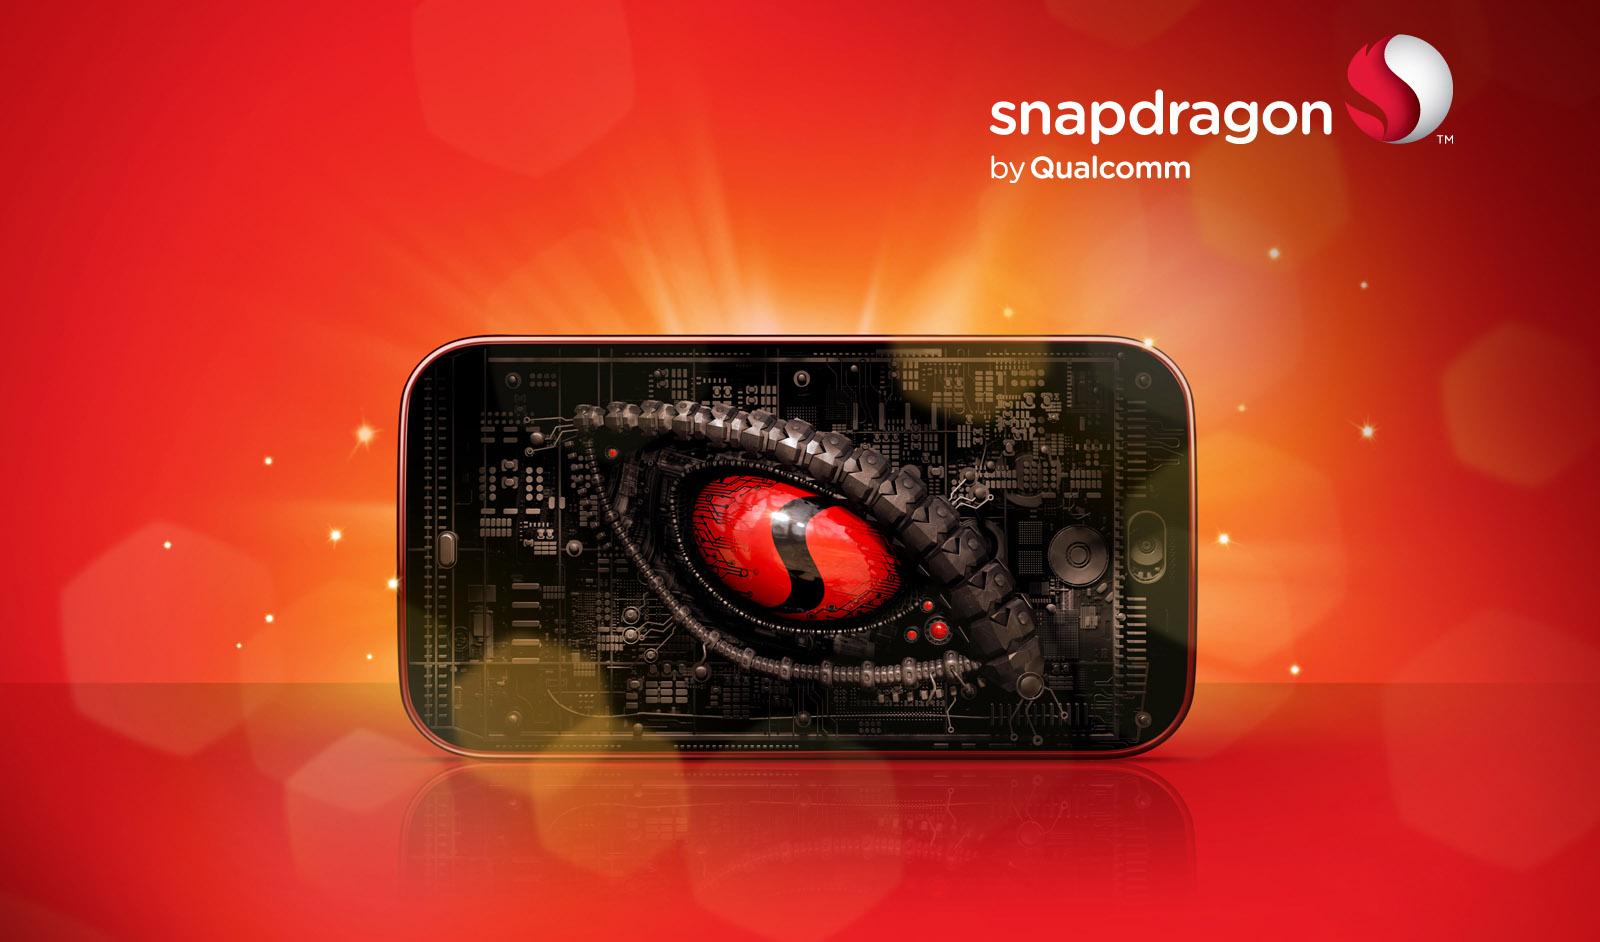 Snapdragon (1)